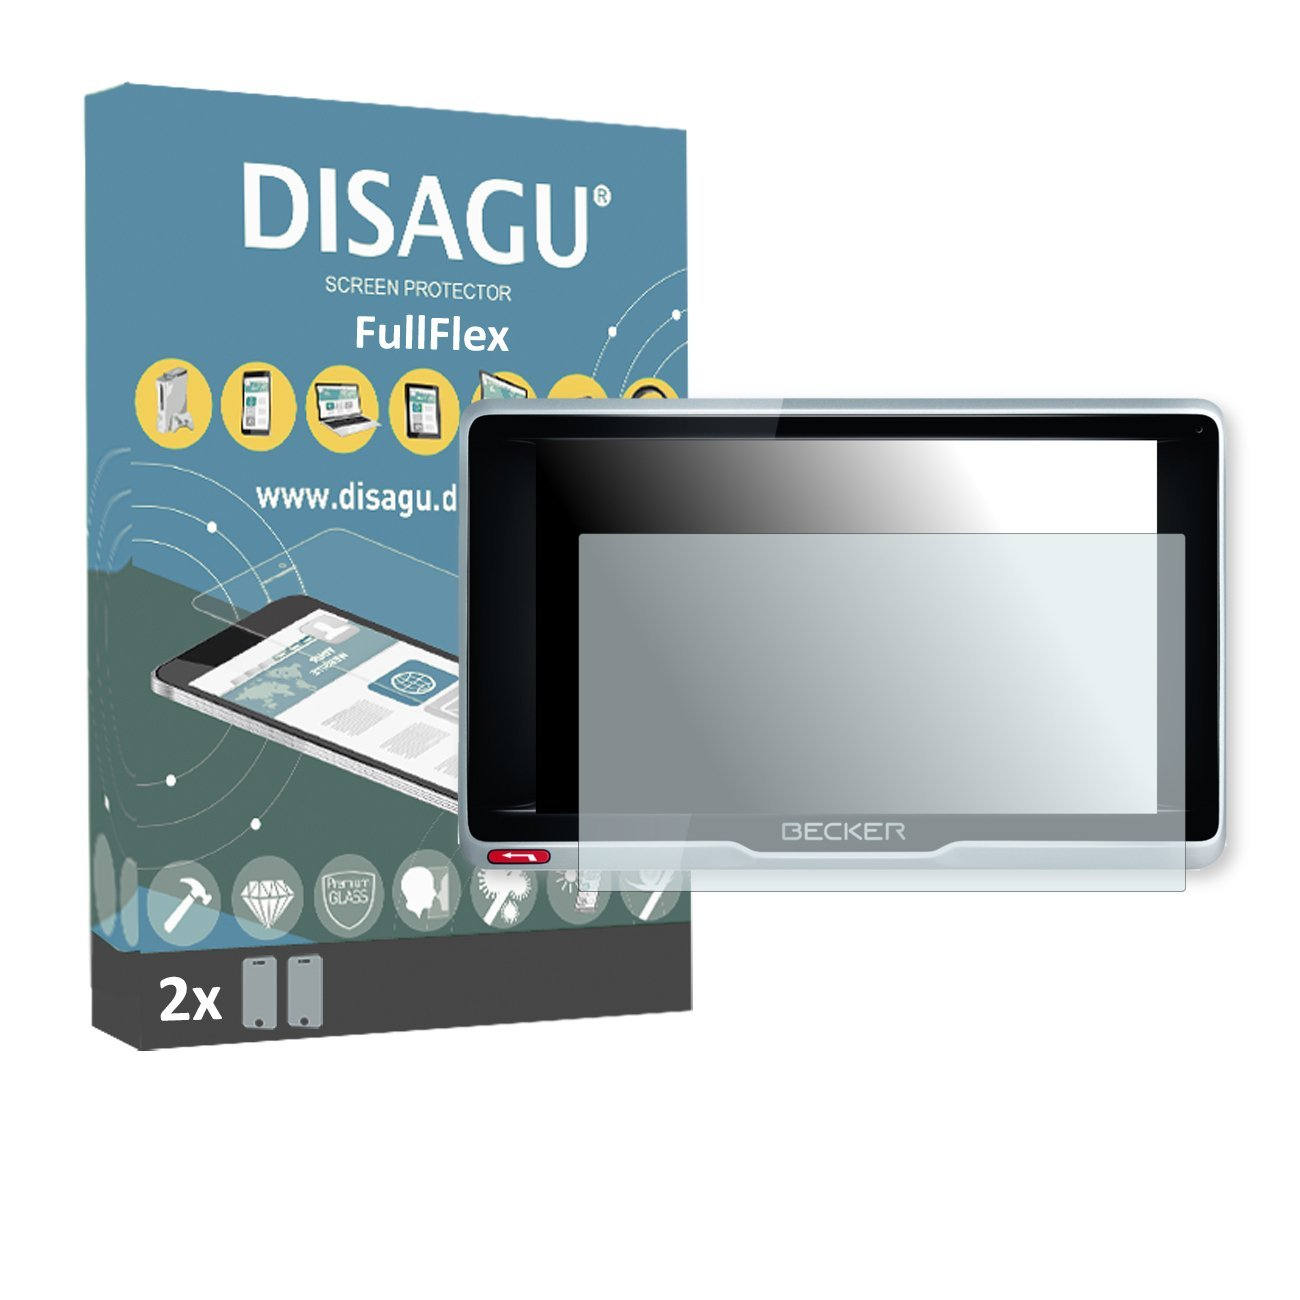 2 x Disagu FullFlex screen protector for Becker Active.6 LMU plus foil screen protector